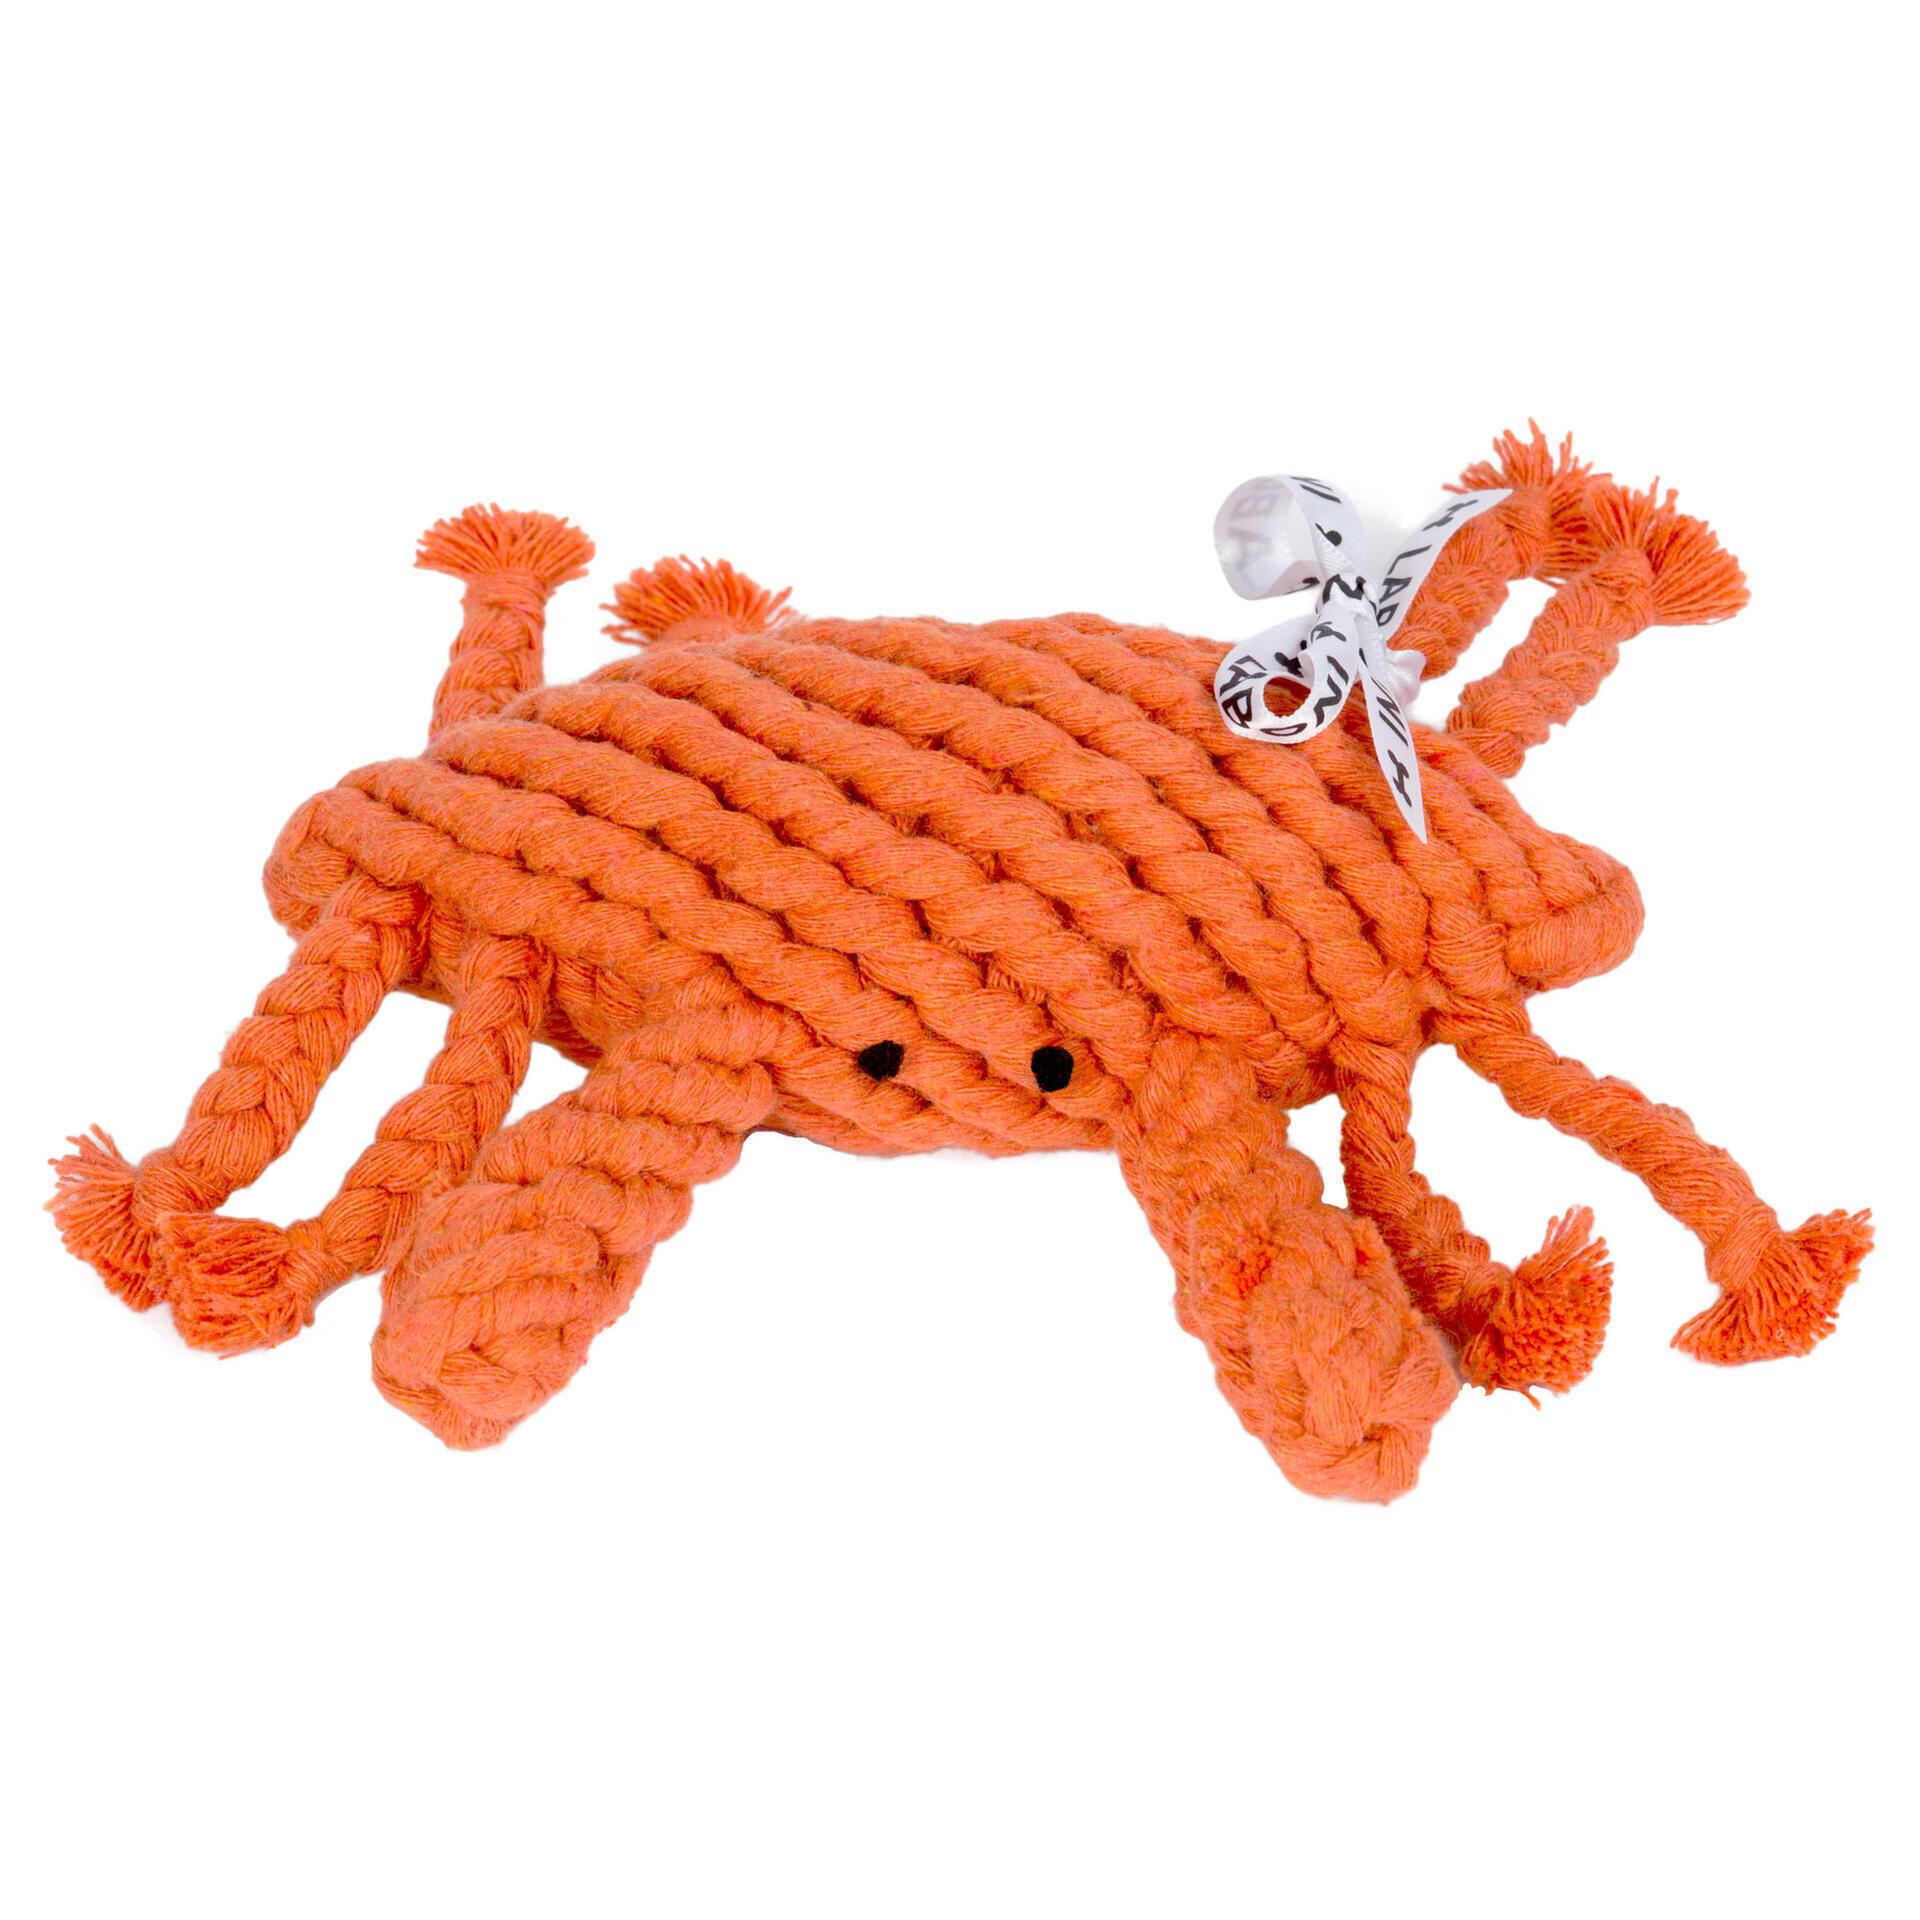 Kristof Krabbe - Kult-Spielzeug für Hunde